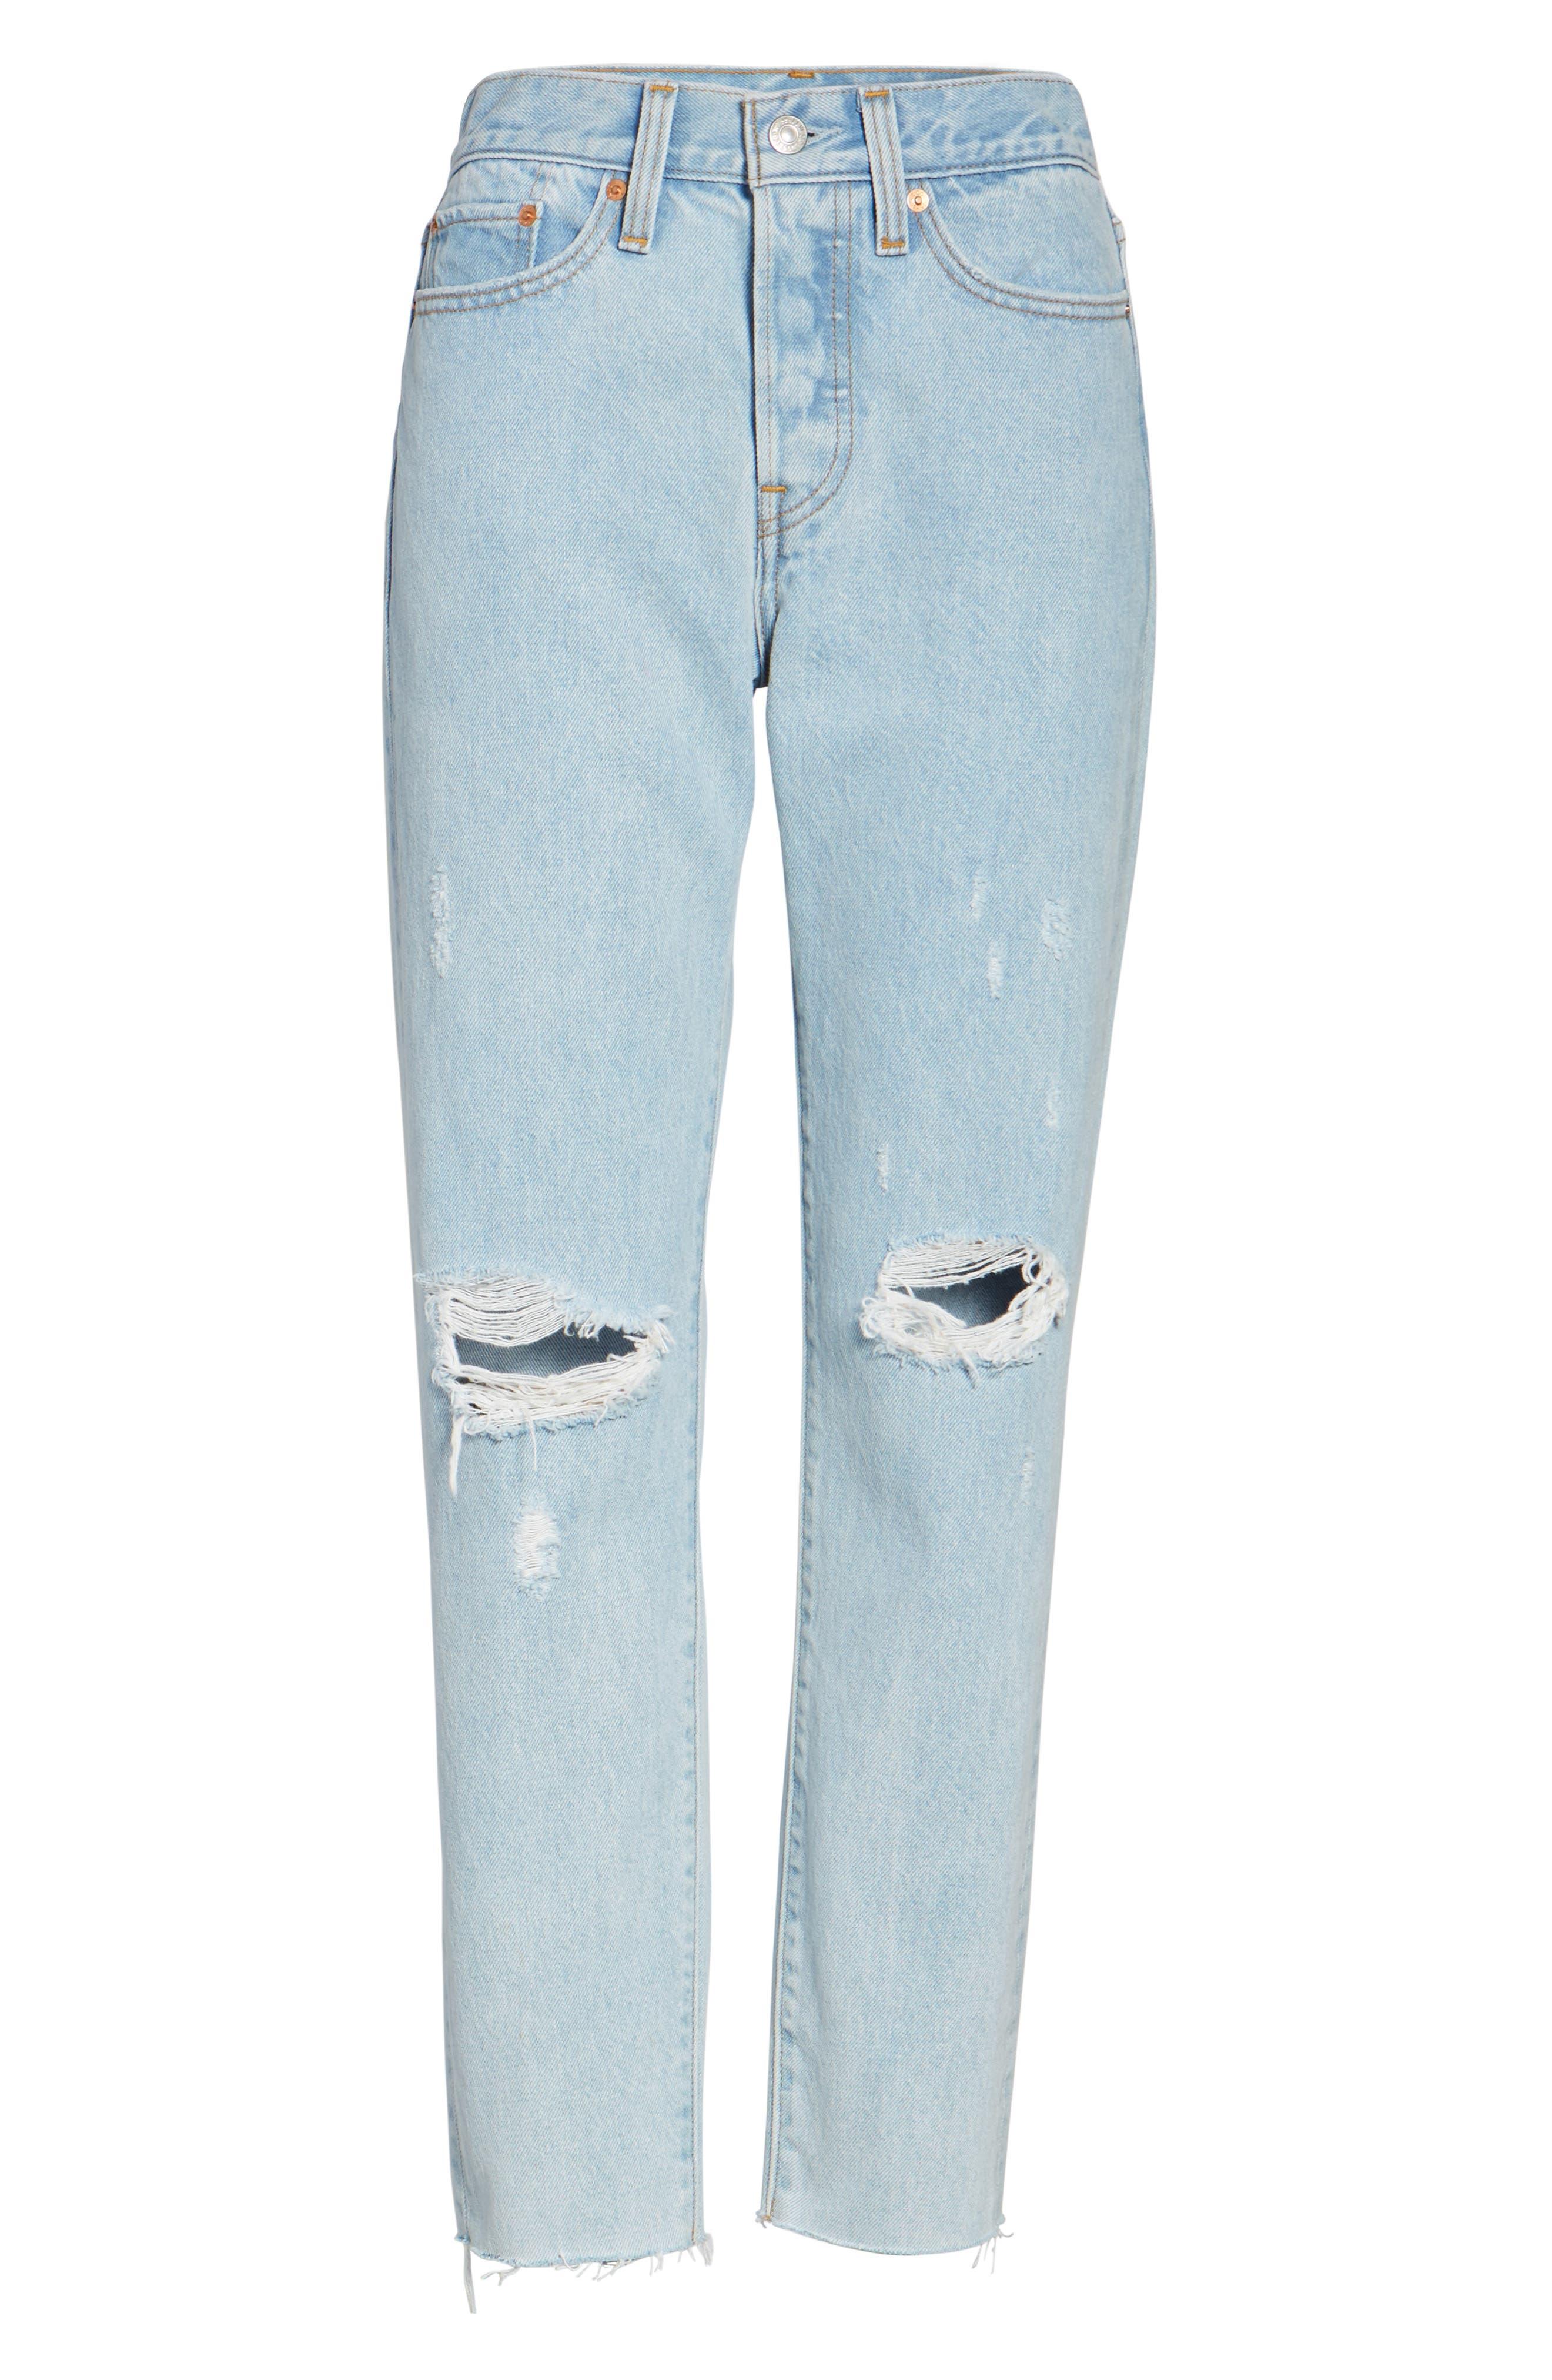 Wedgie High Waist Crop Jeans,                             Alternate thumbnail 6, color,                             450